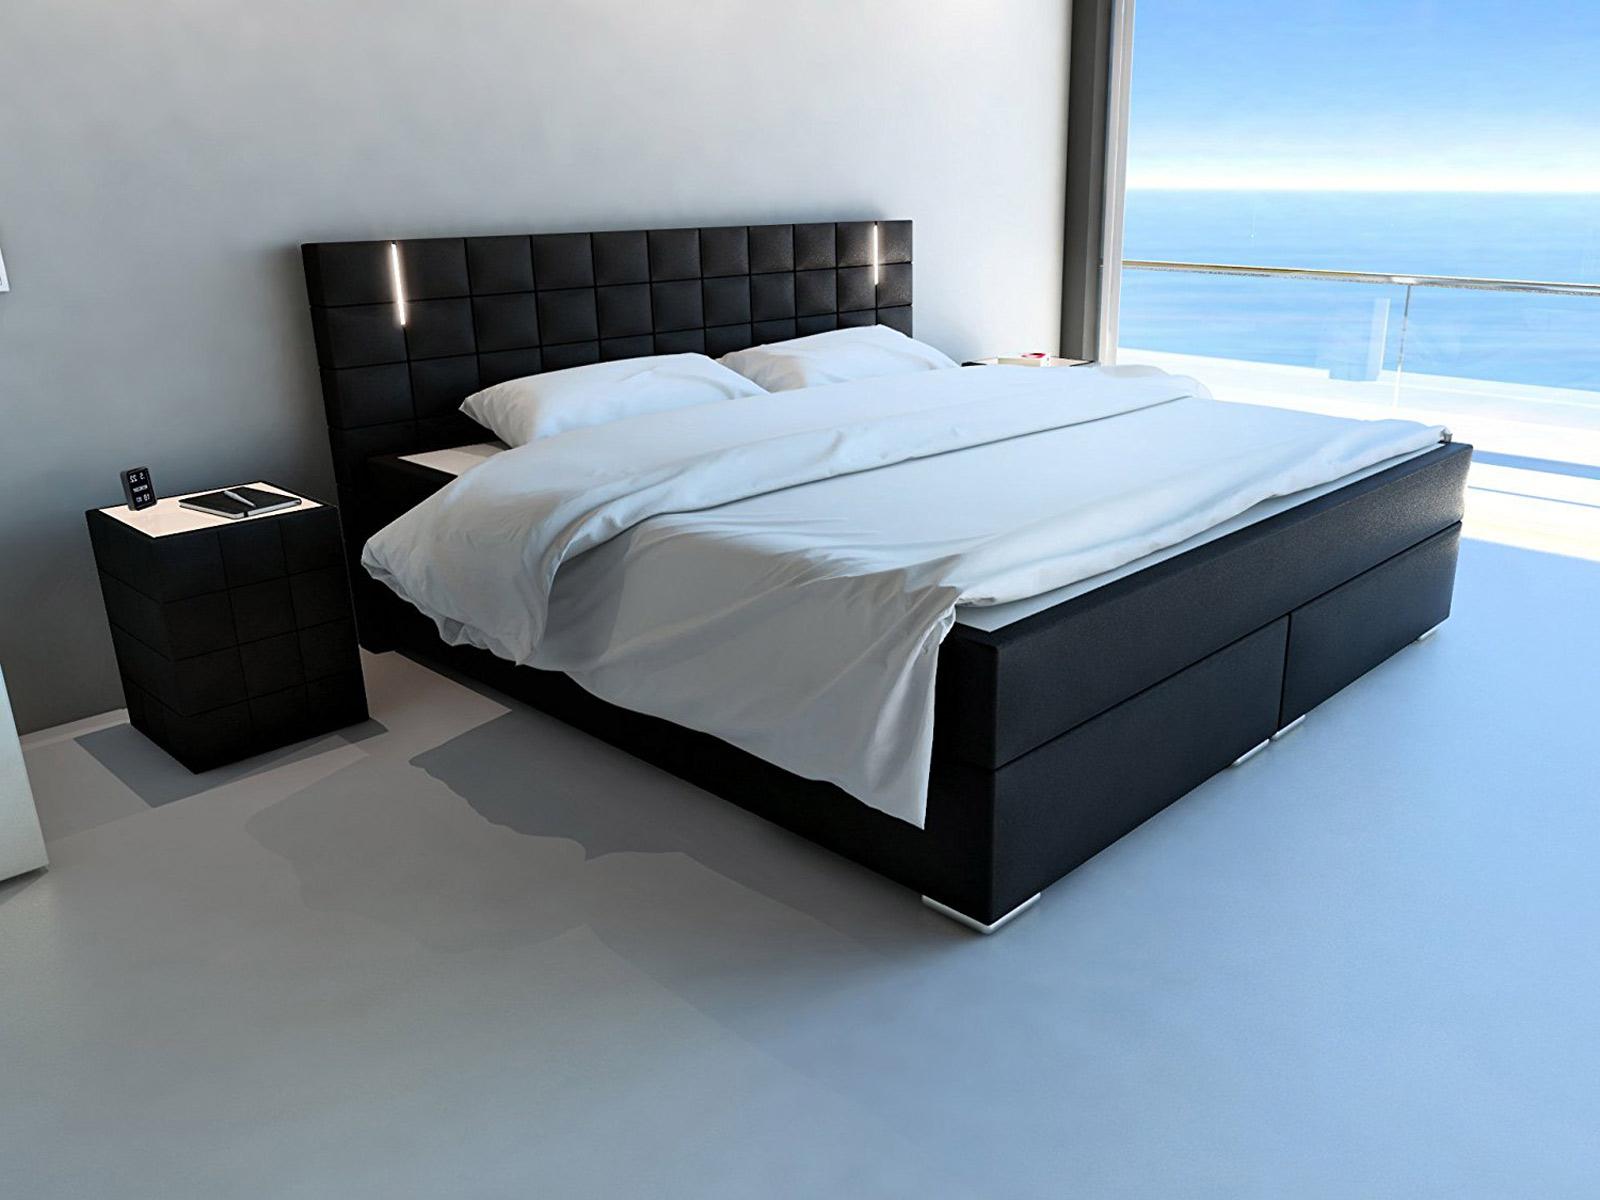 springbox bett latest bruno im raum with springbox bett fabulous webstoff inkl matratze topper. Black Bedroom Furniture Sets. Home Design Ideas